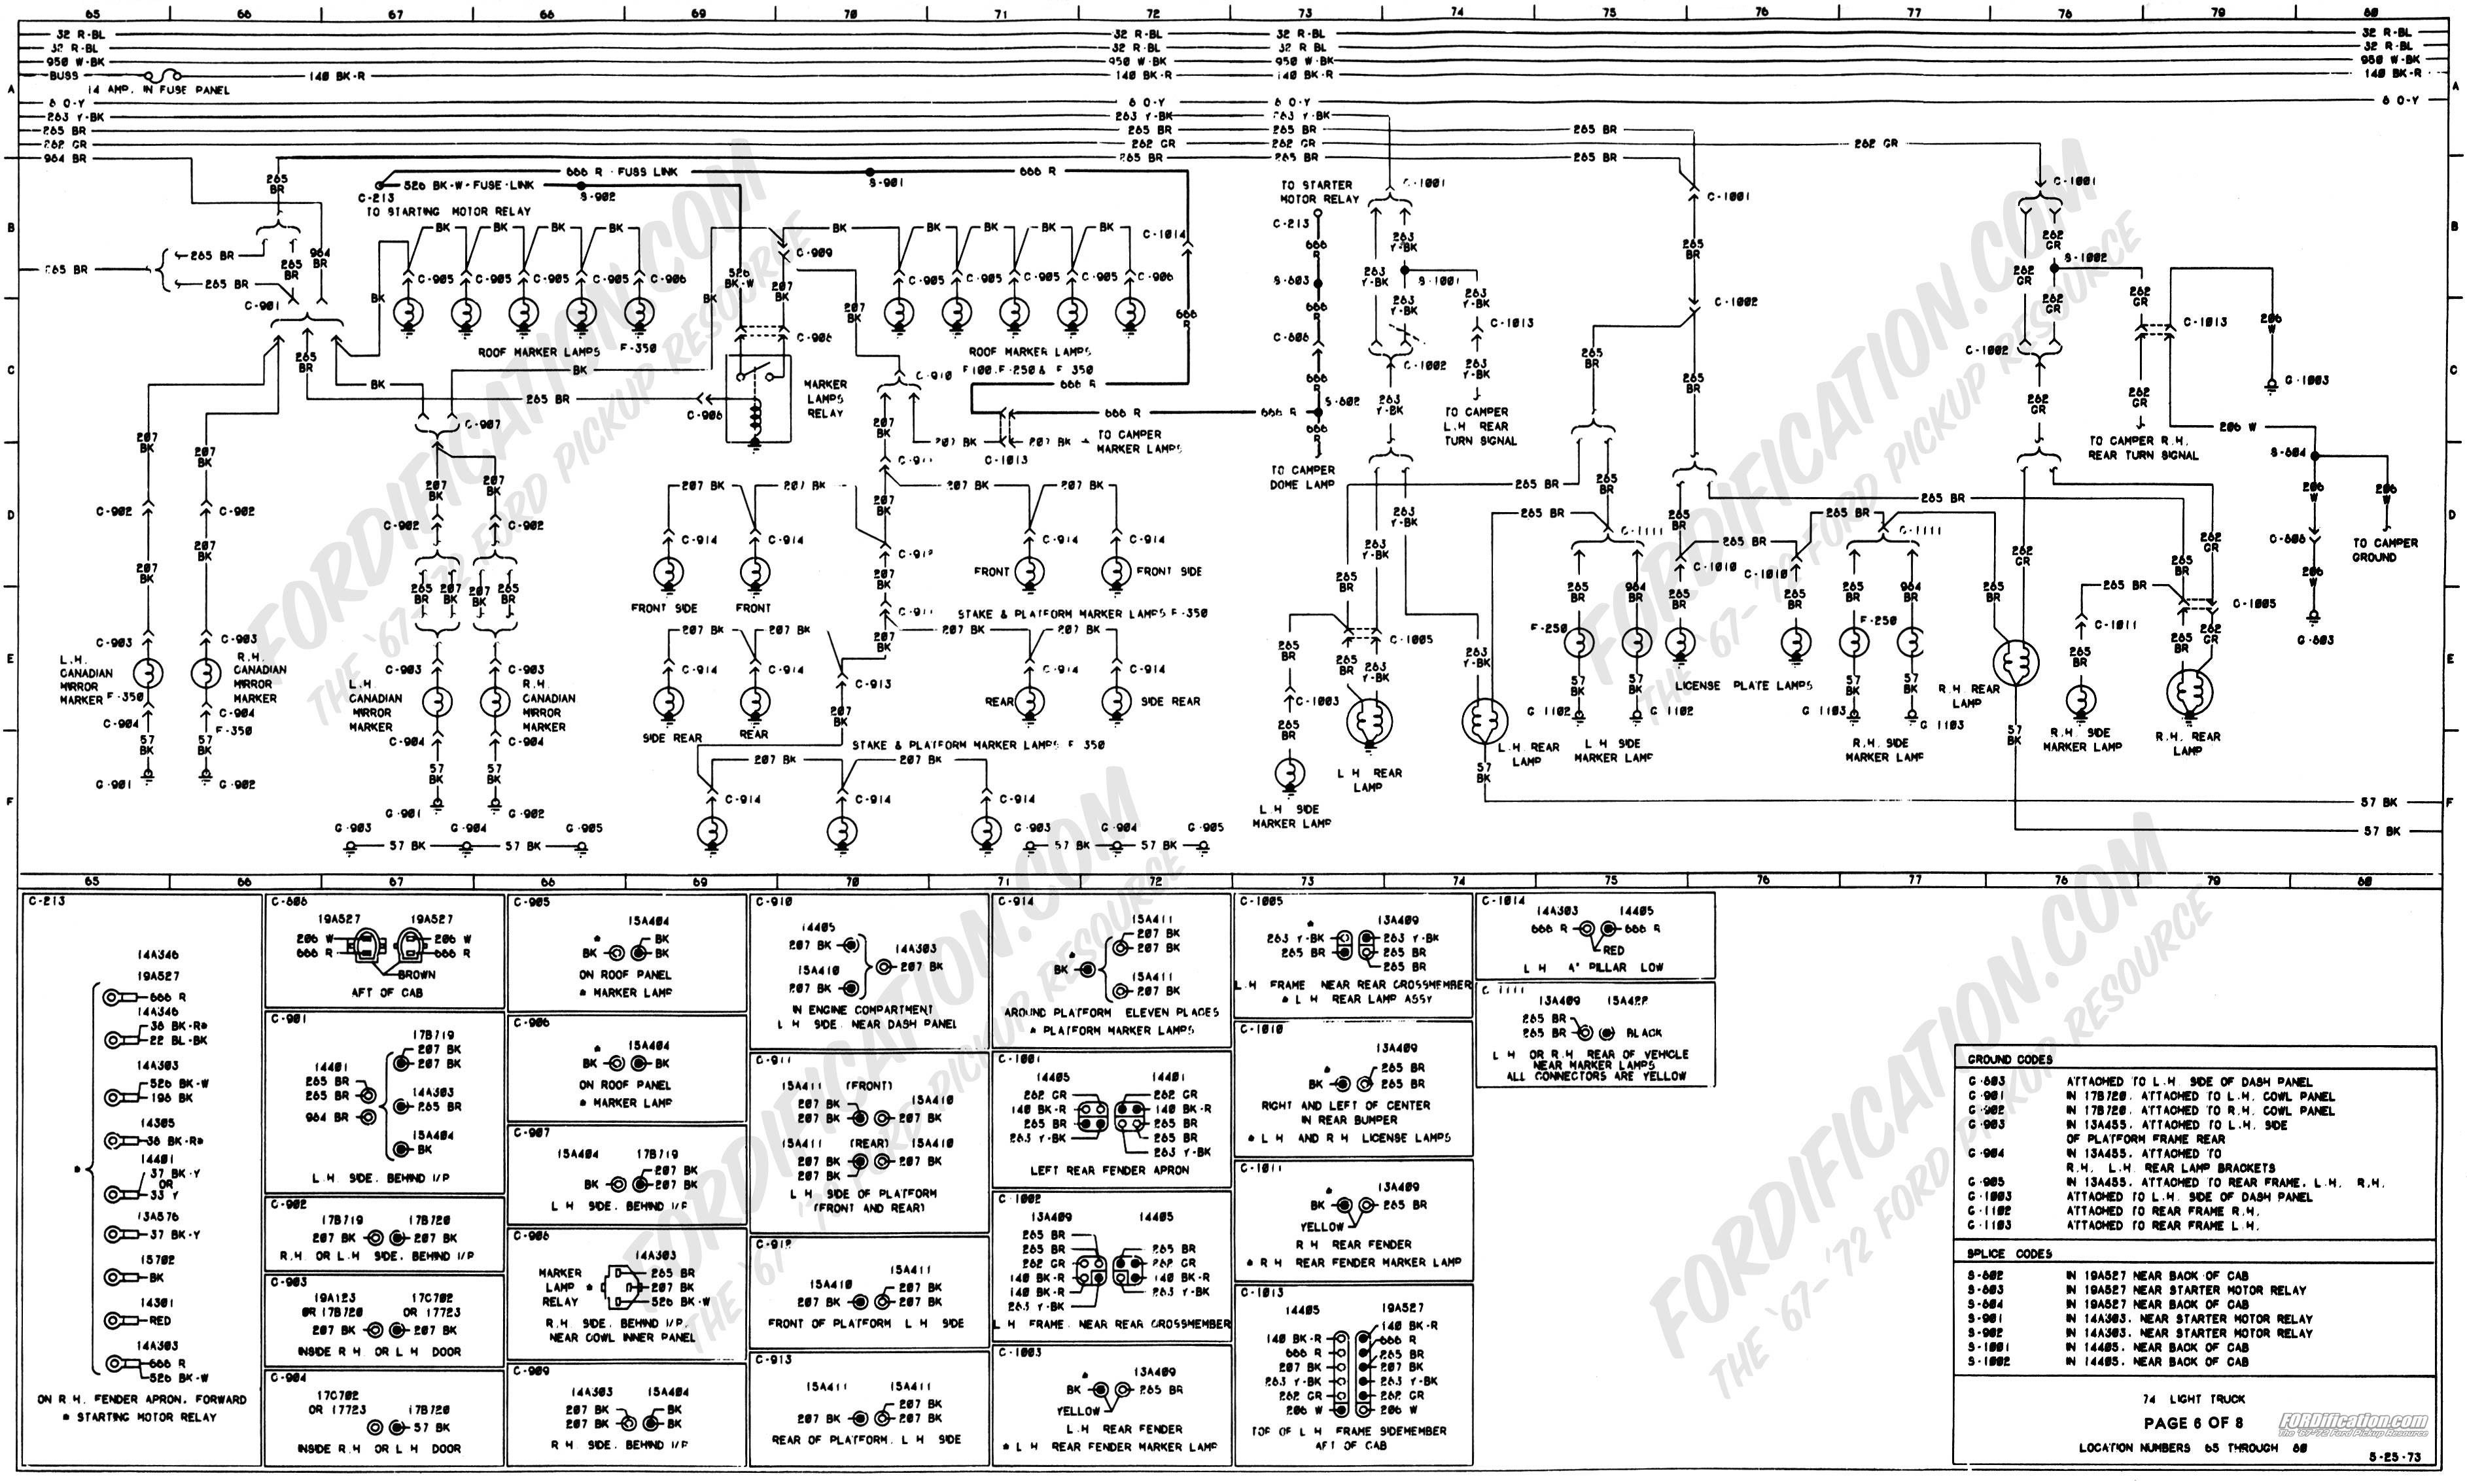 1979 ford F150 Wiring Diagram | Free Wiring Diagram